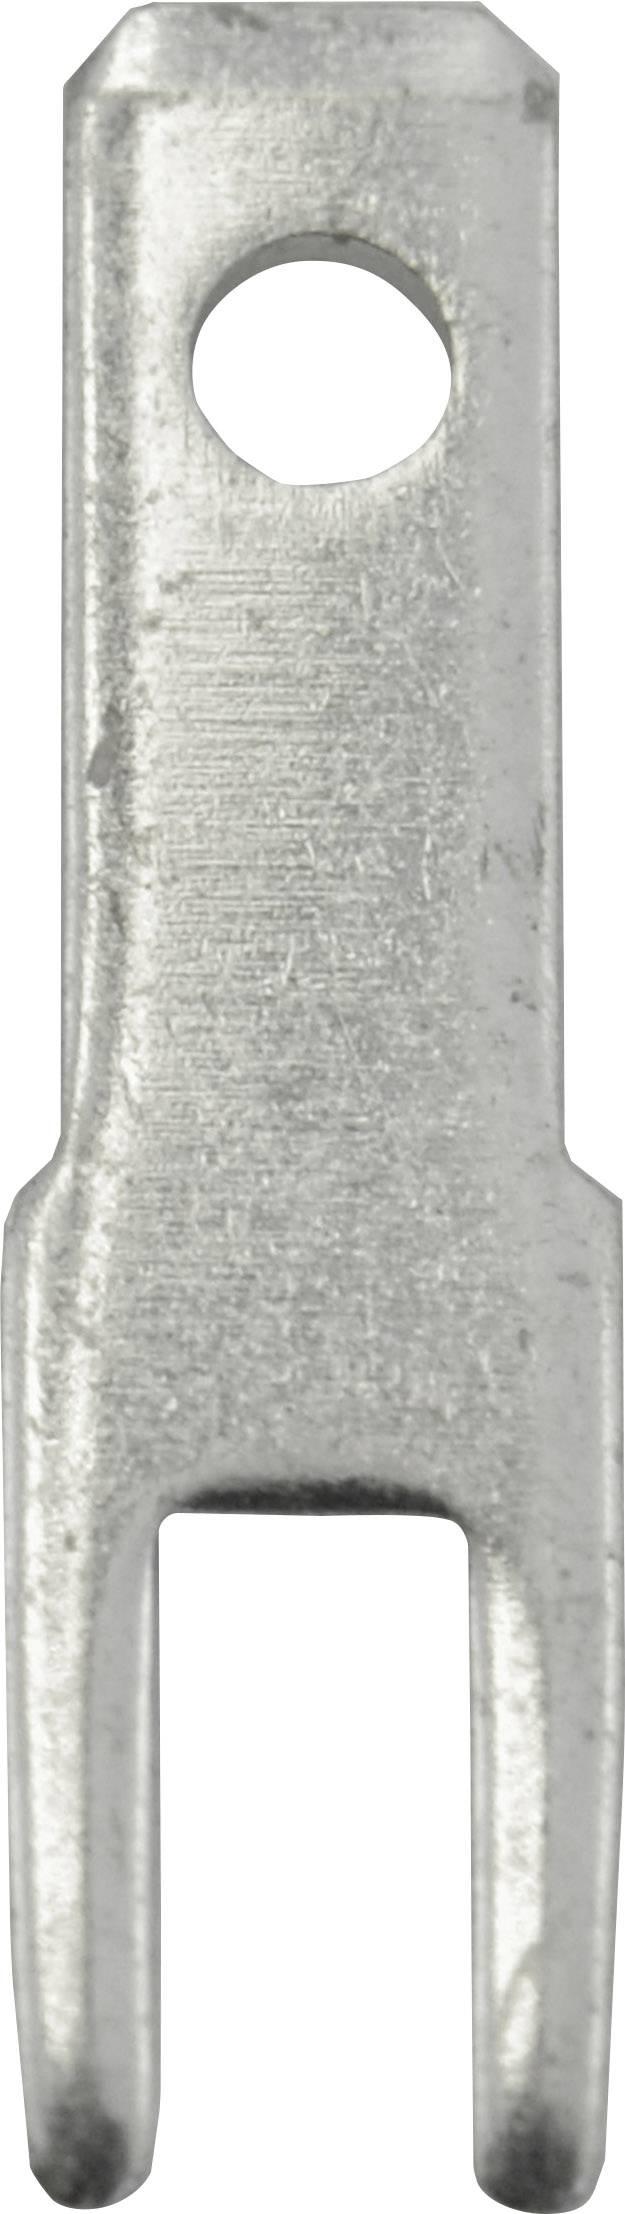 Faston zástrčka Vogt Verbindungstechnik 378508.68 2.8 mm x 0.8 mm, 180 °, bez izolace, kov, 100 ks